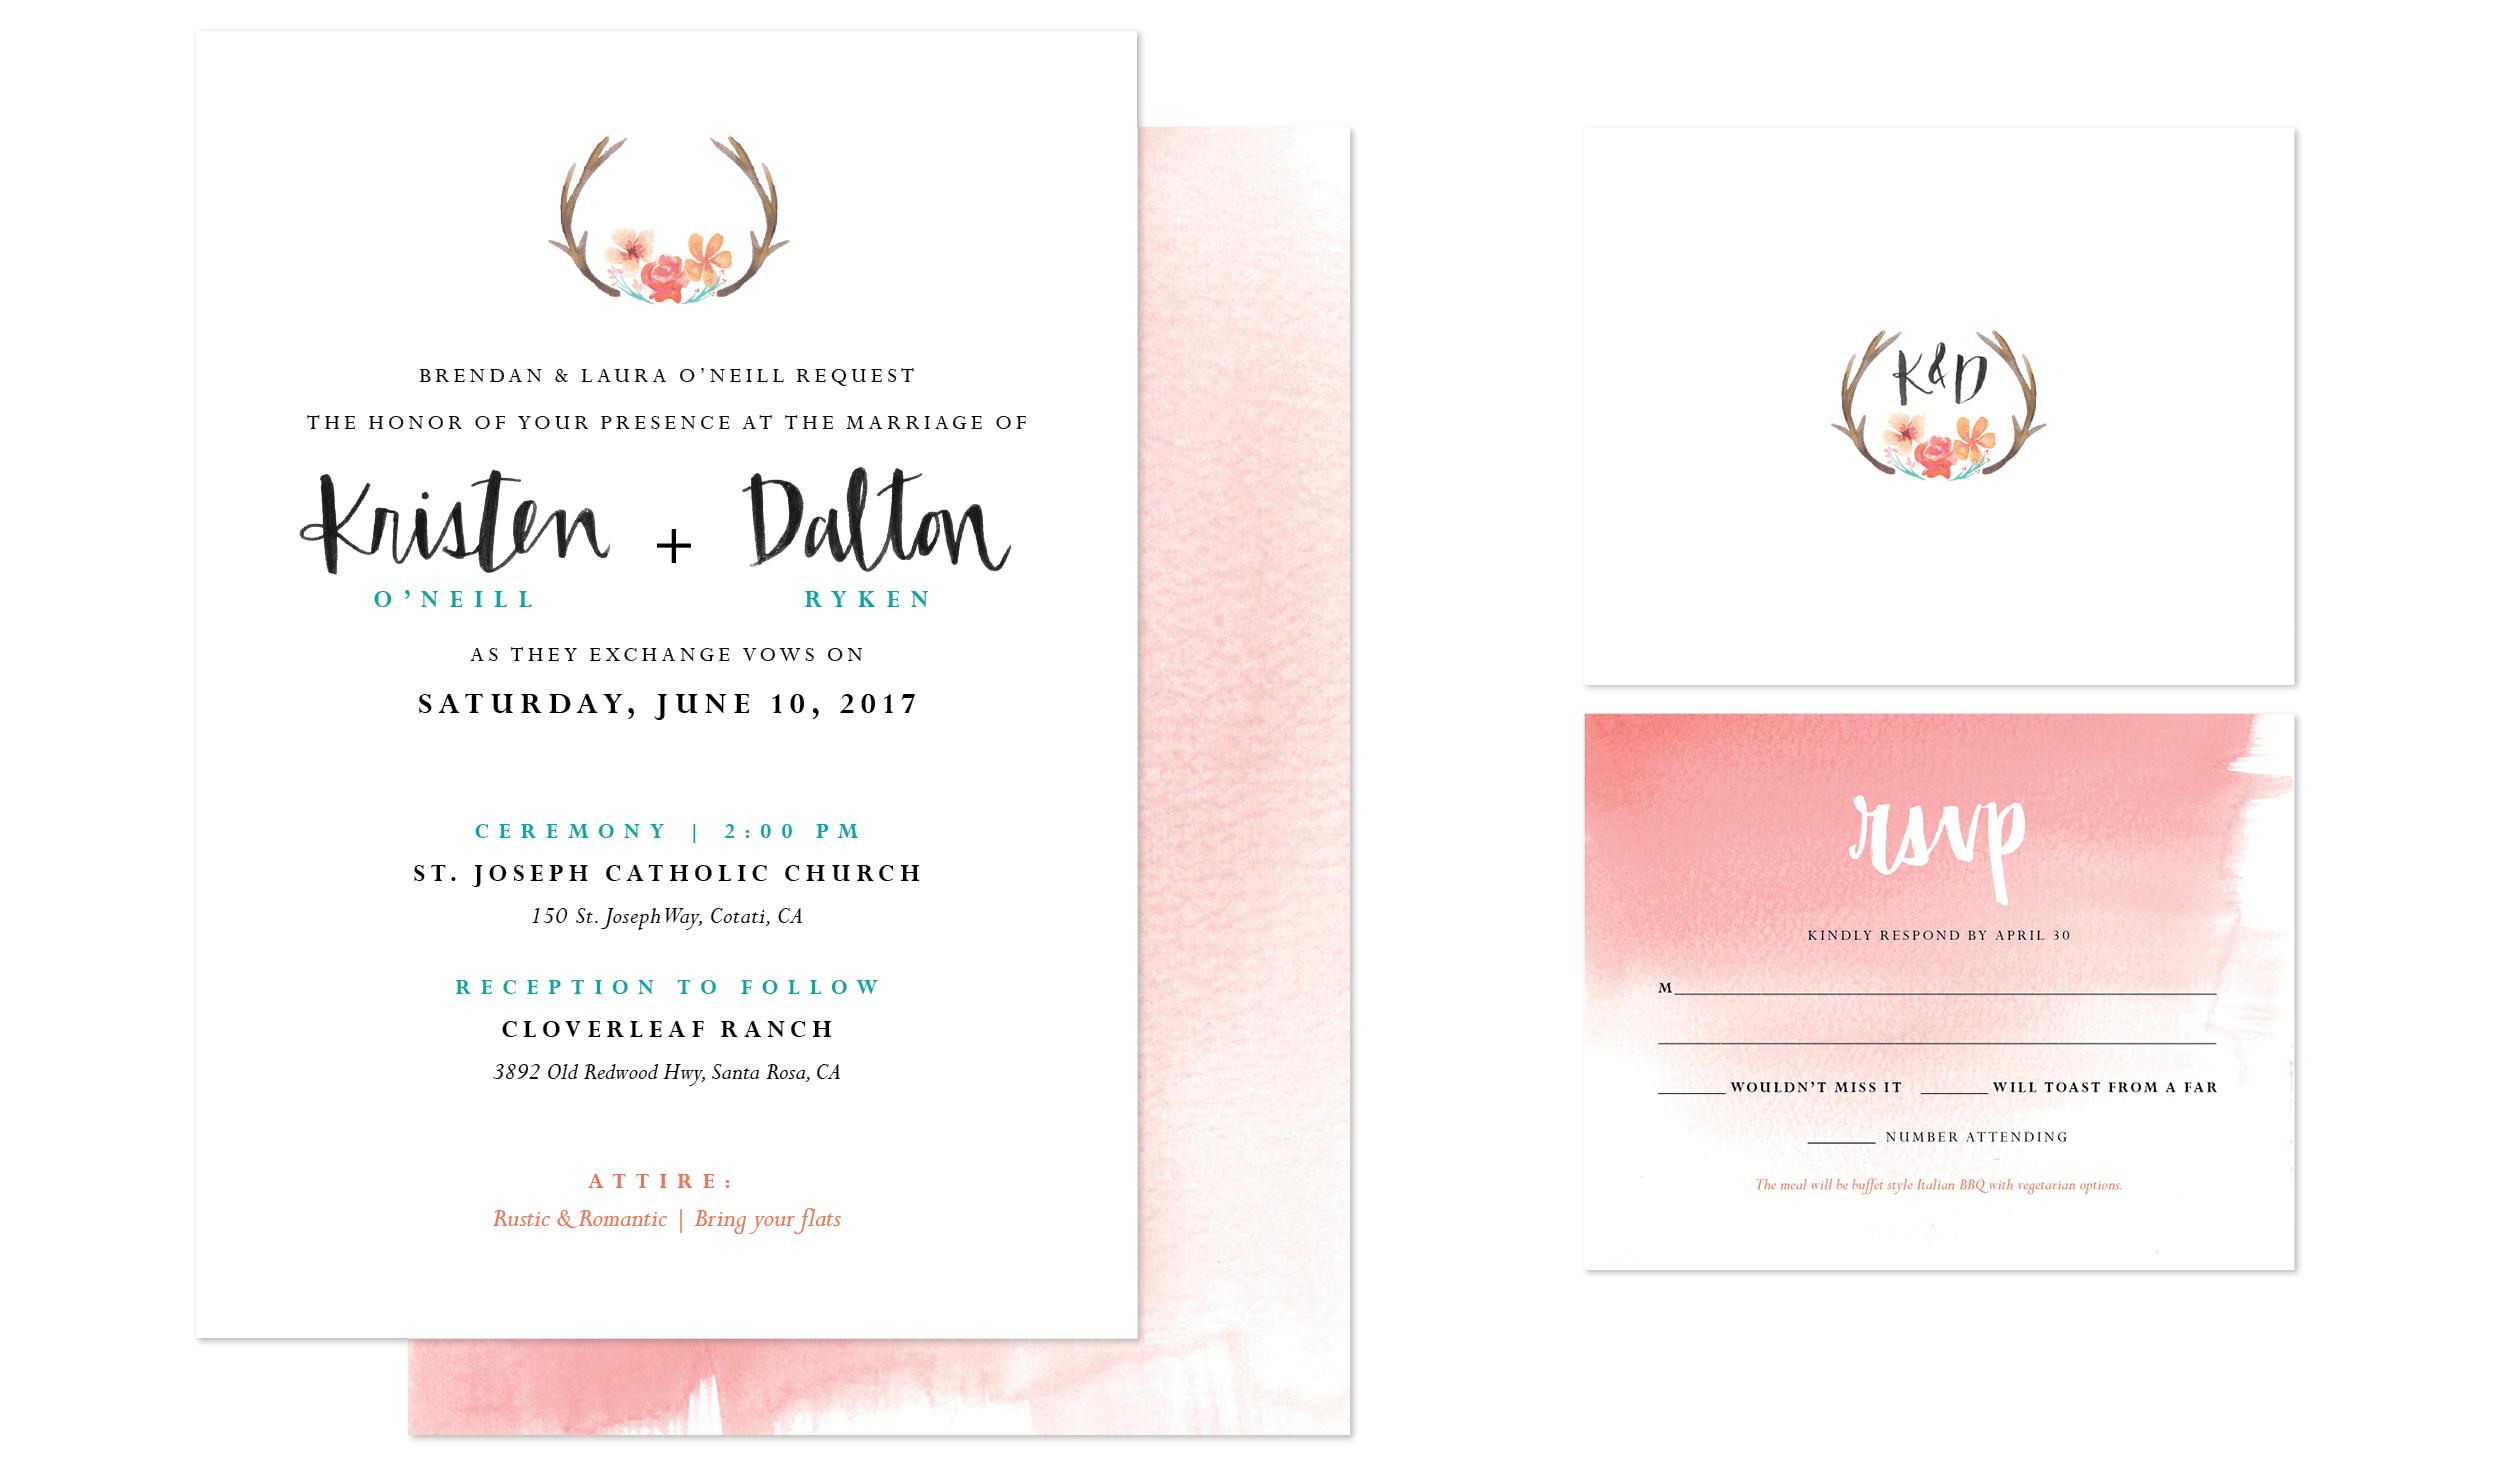 wedding invitation and RSVP card